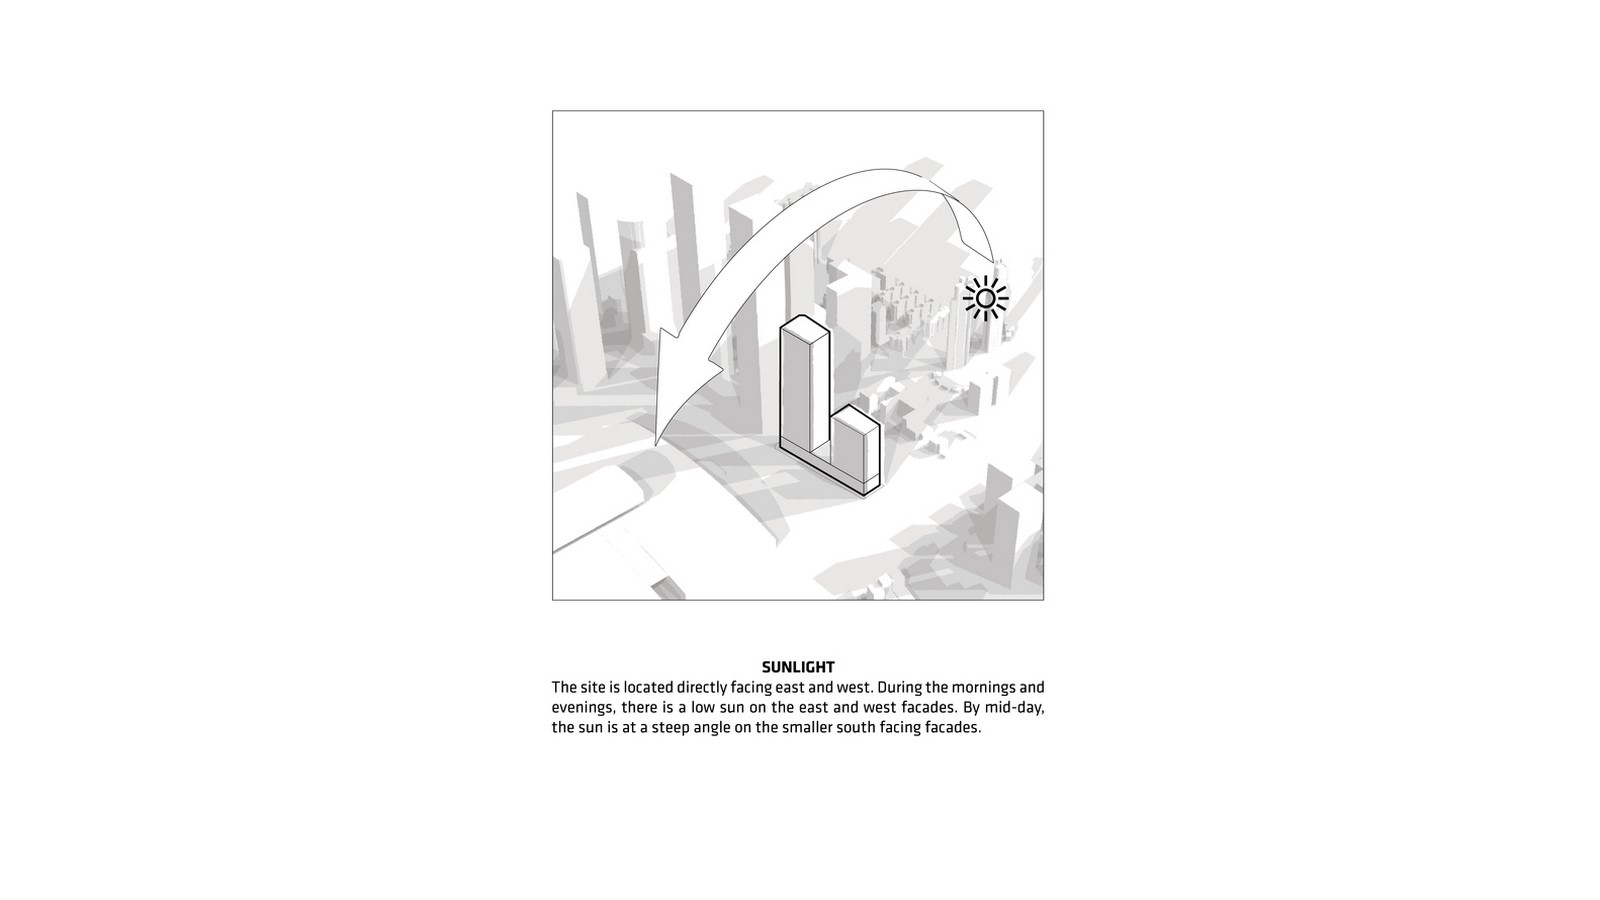 Shenzhen International Energy Mansion by BIG: The uncommon facade design - Sheet3